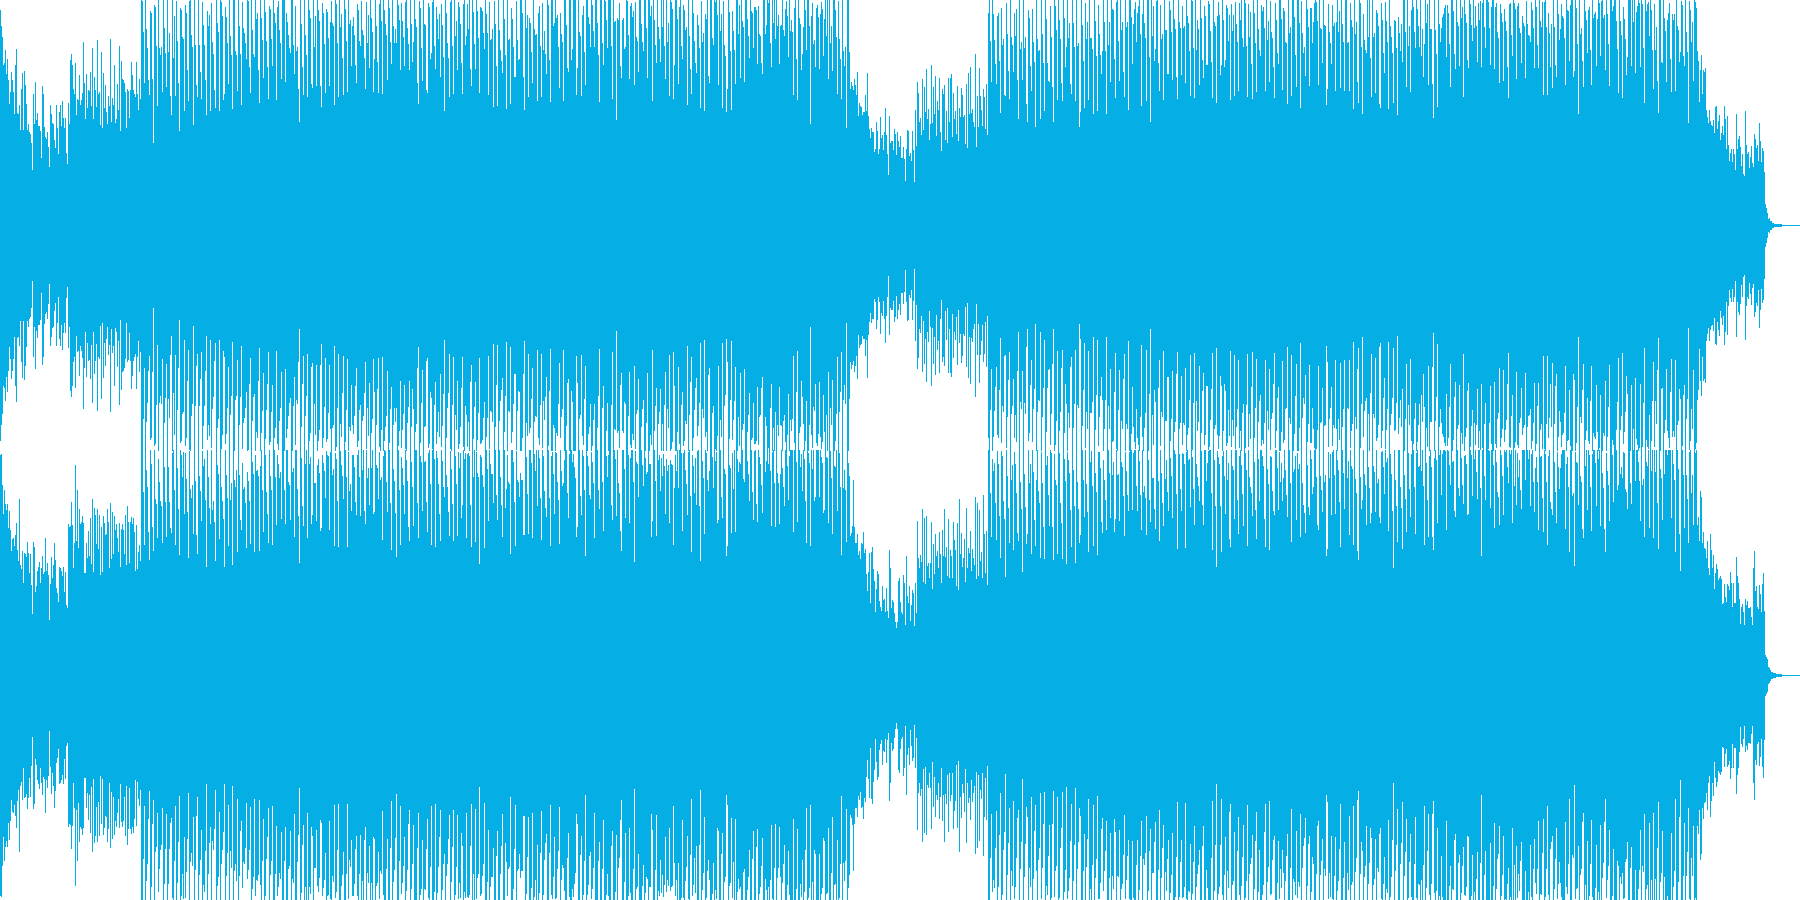 EDMクラブ系ダンスミュージック-63の再生済みの波形